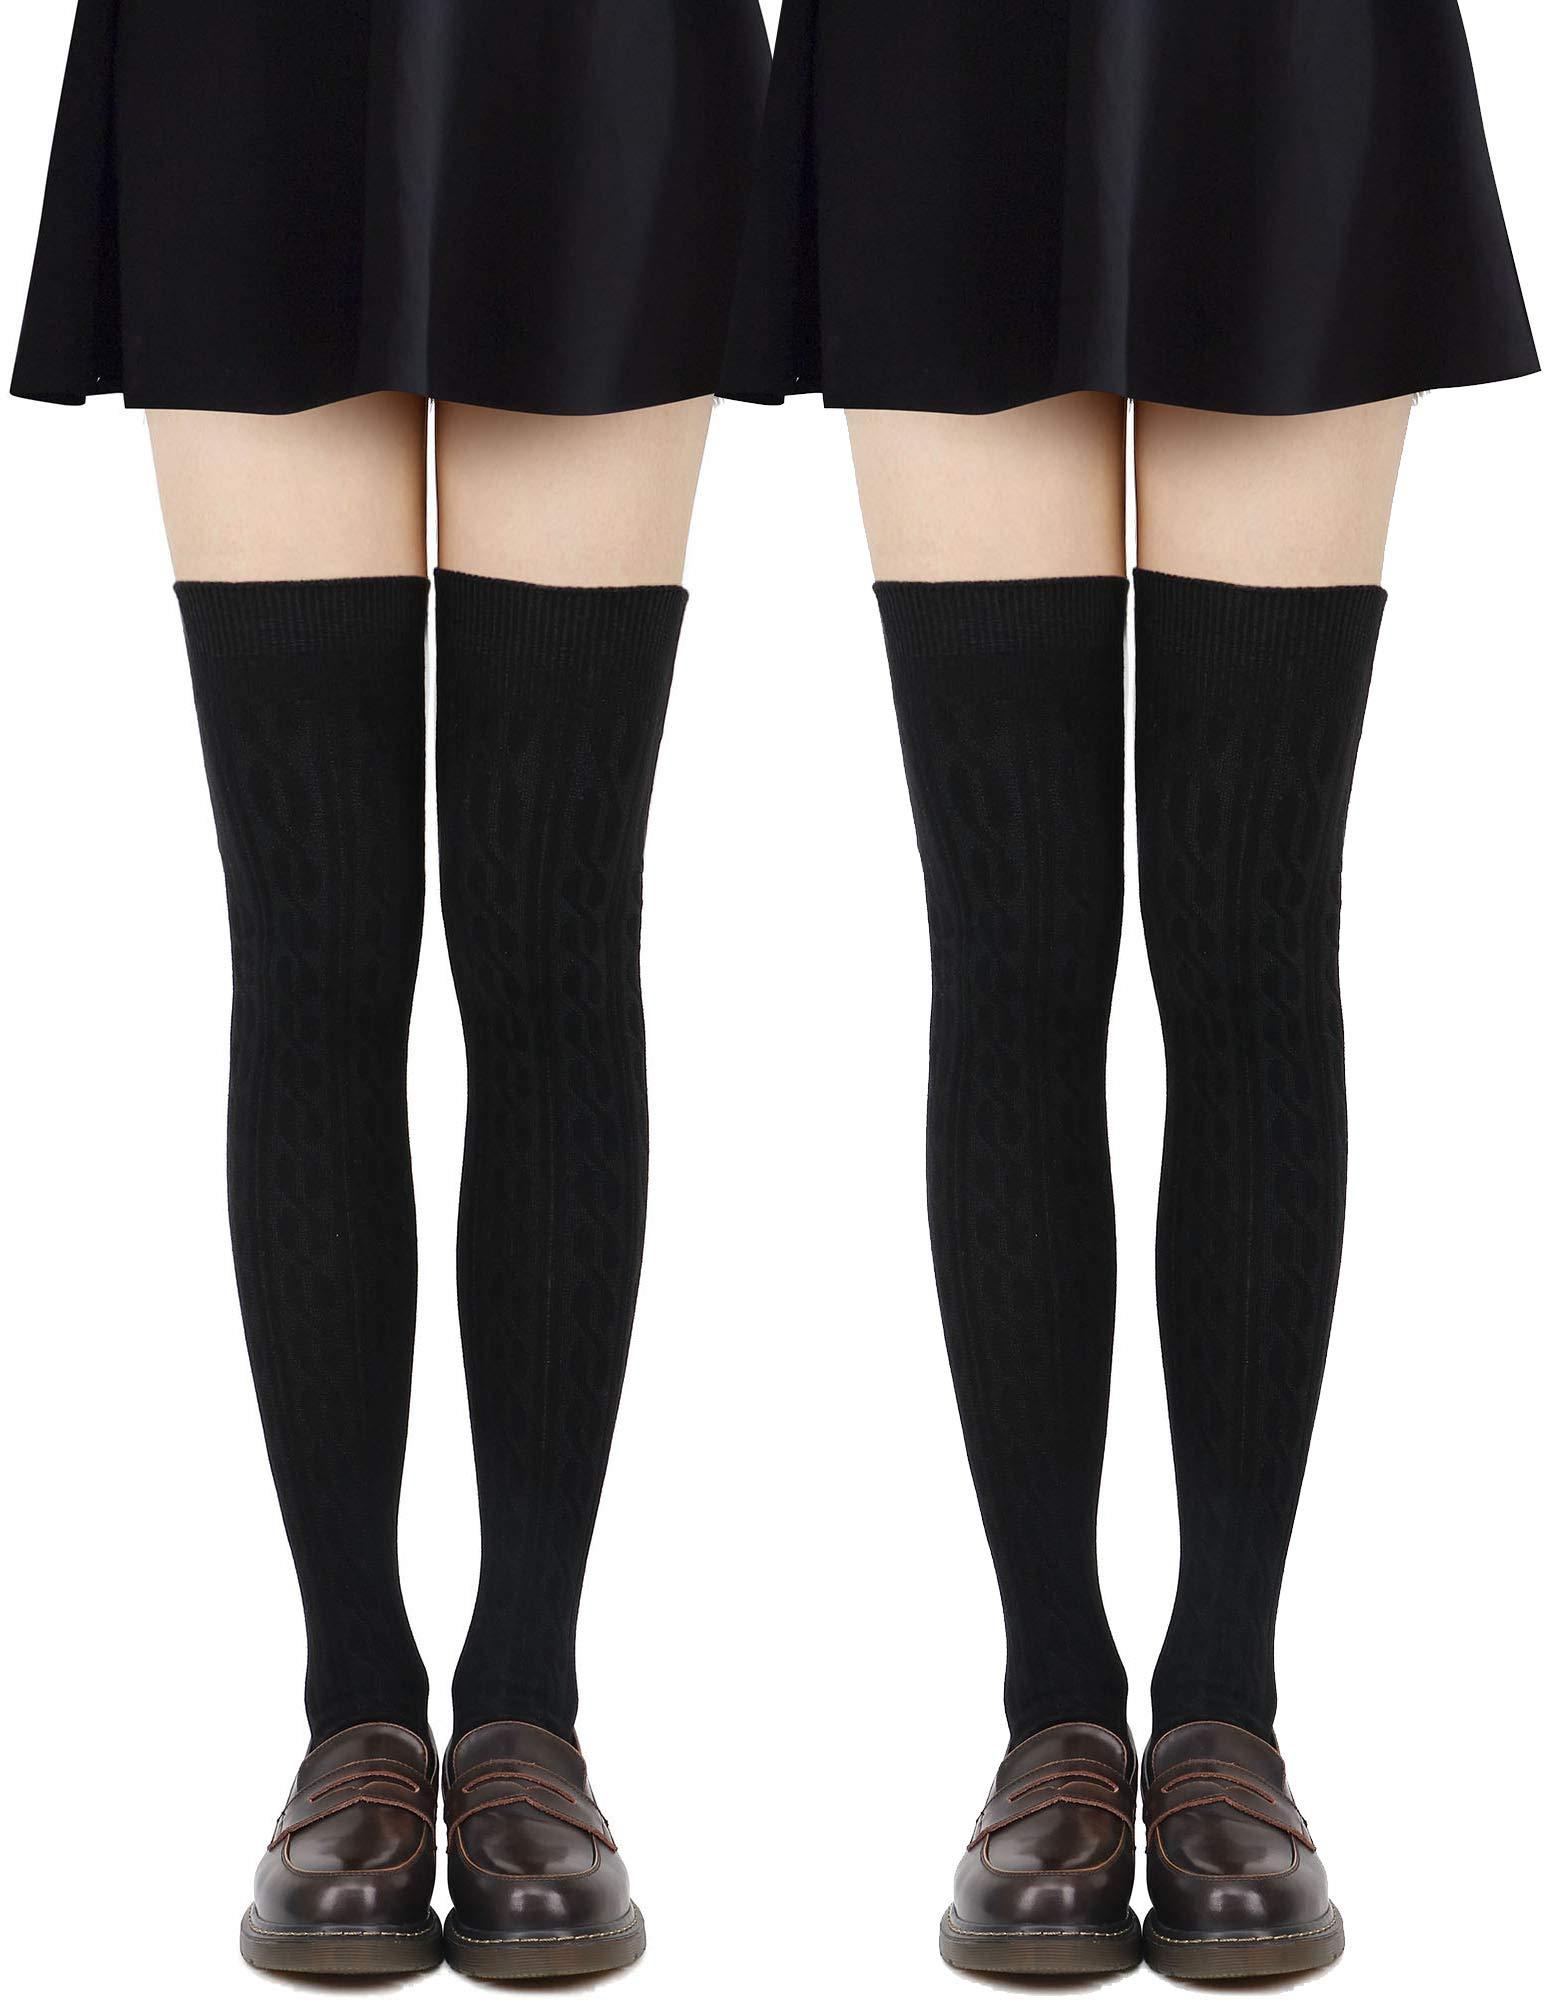 Women's Cable Knit Knee-High Winter Socks - 1-3 Packs